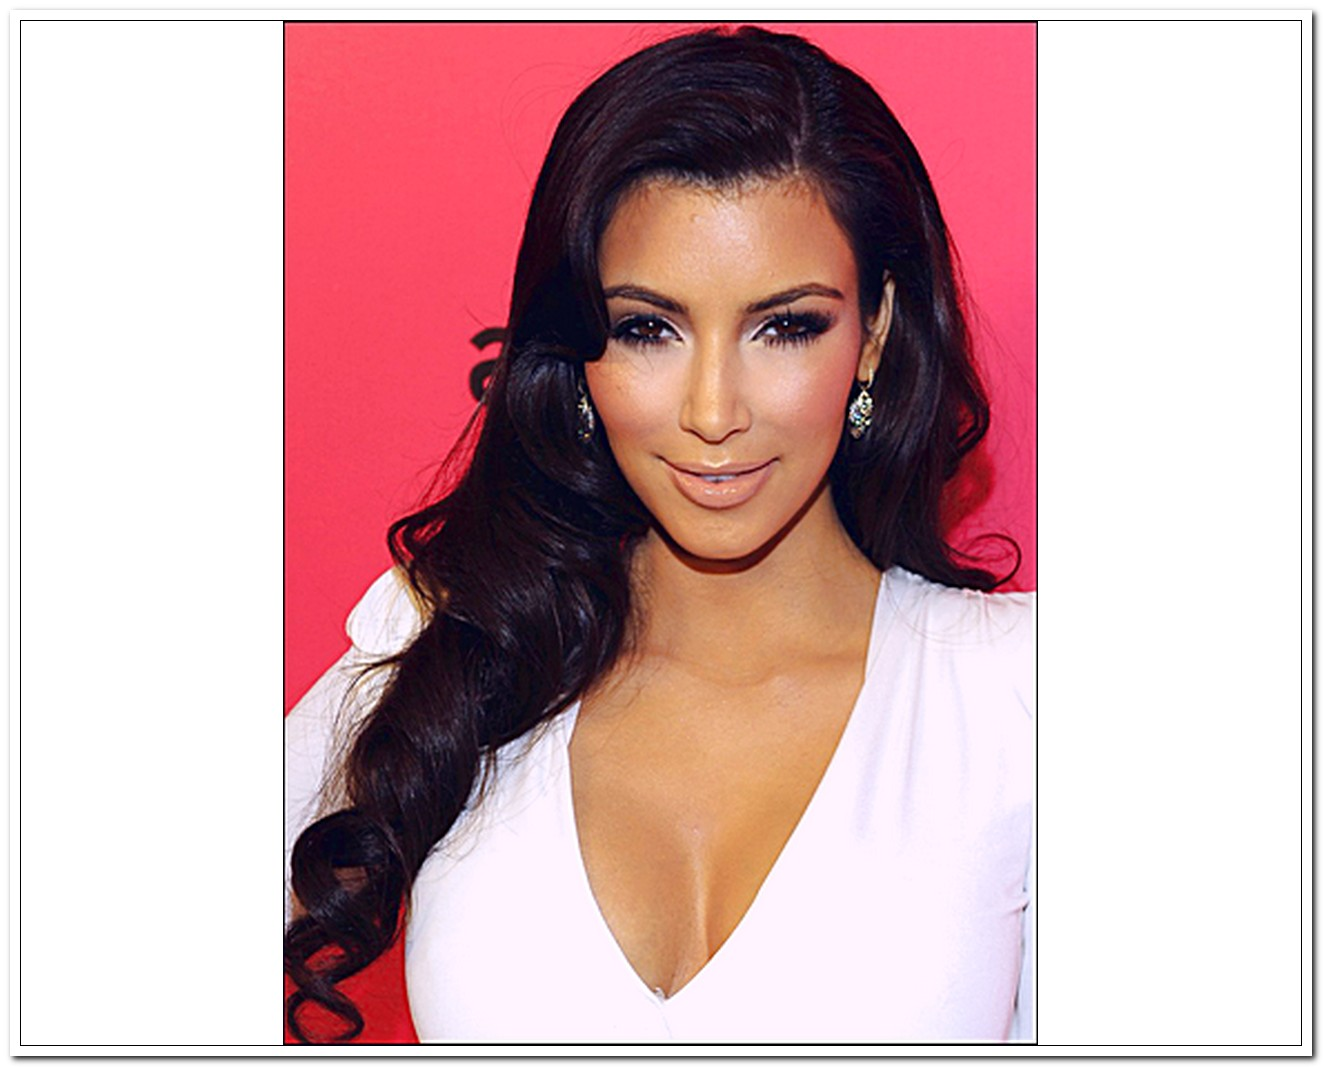 Image search kim kardashian prom hairstyle Hairstyles khmer star sa sa x kb jpeg